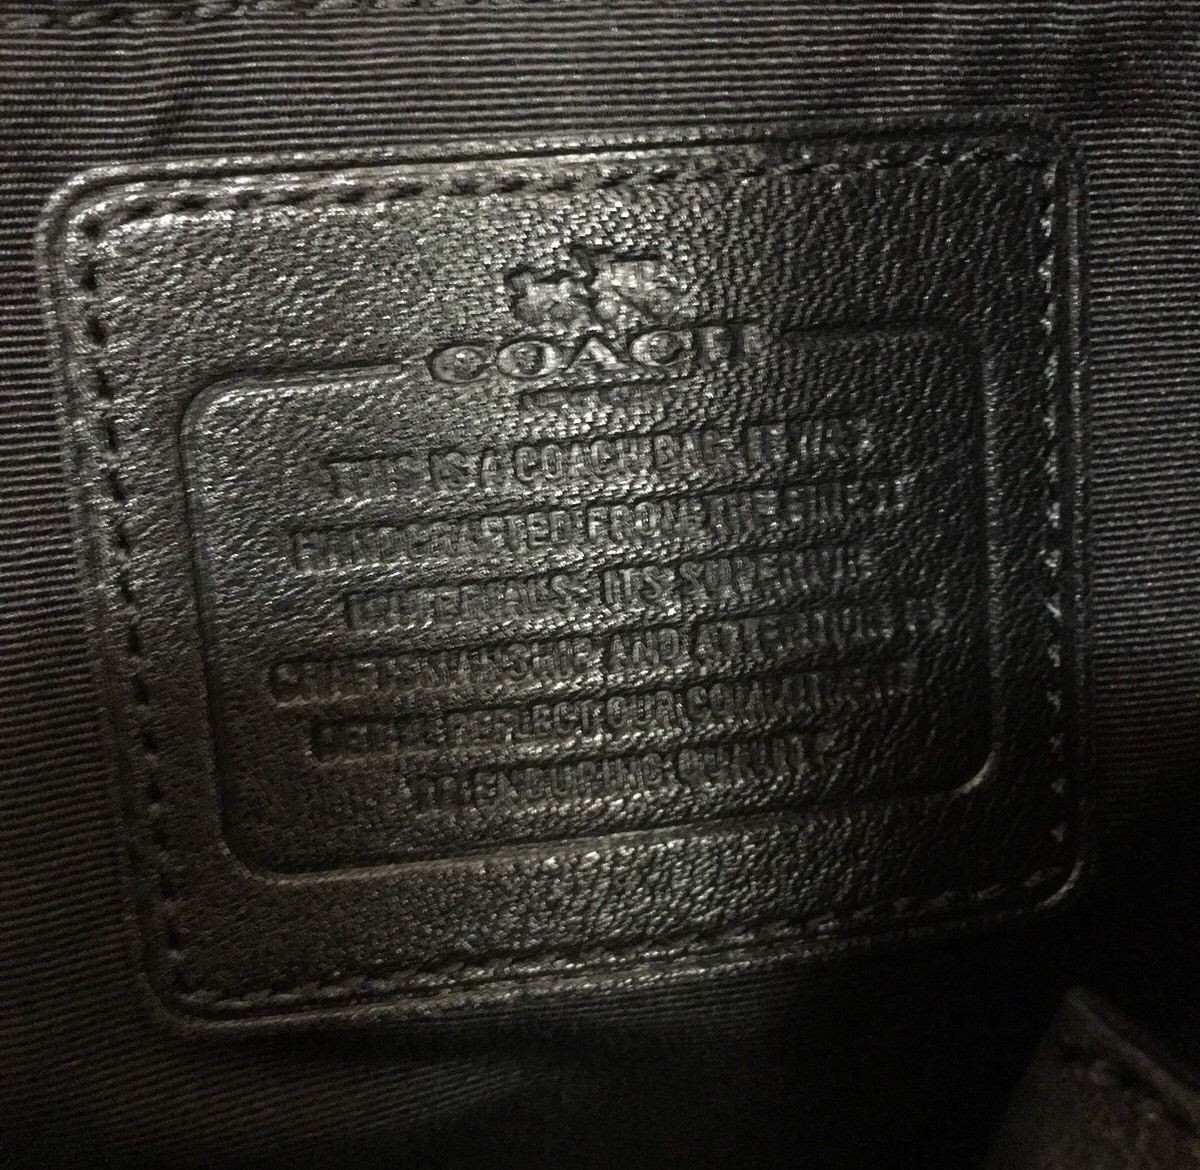 f3fcd8d48 bolsa coach pebble leather mini kelsey satchel crossbody. Carregando zoom.